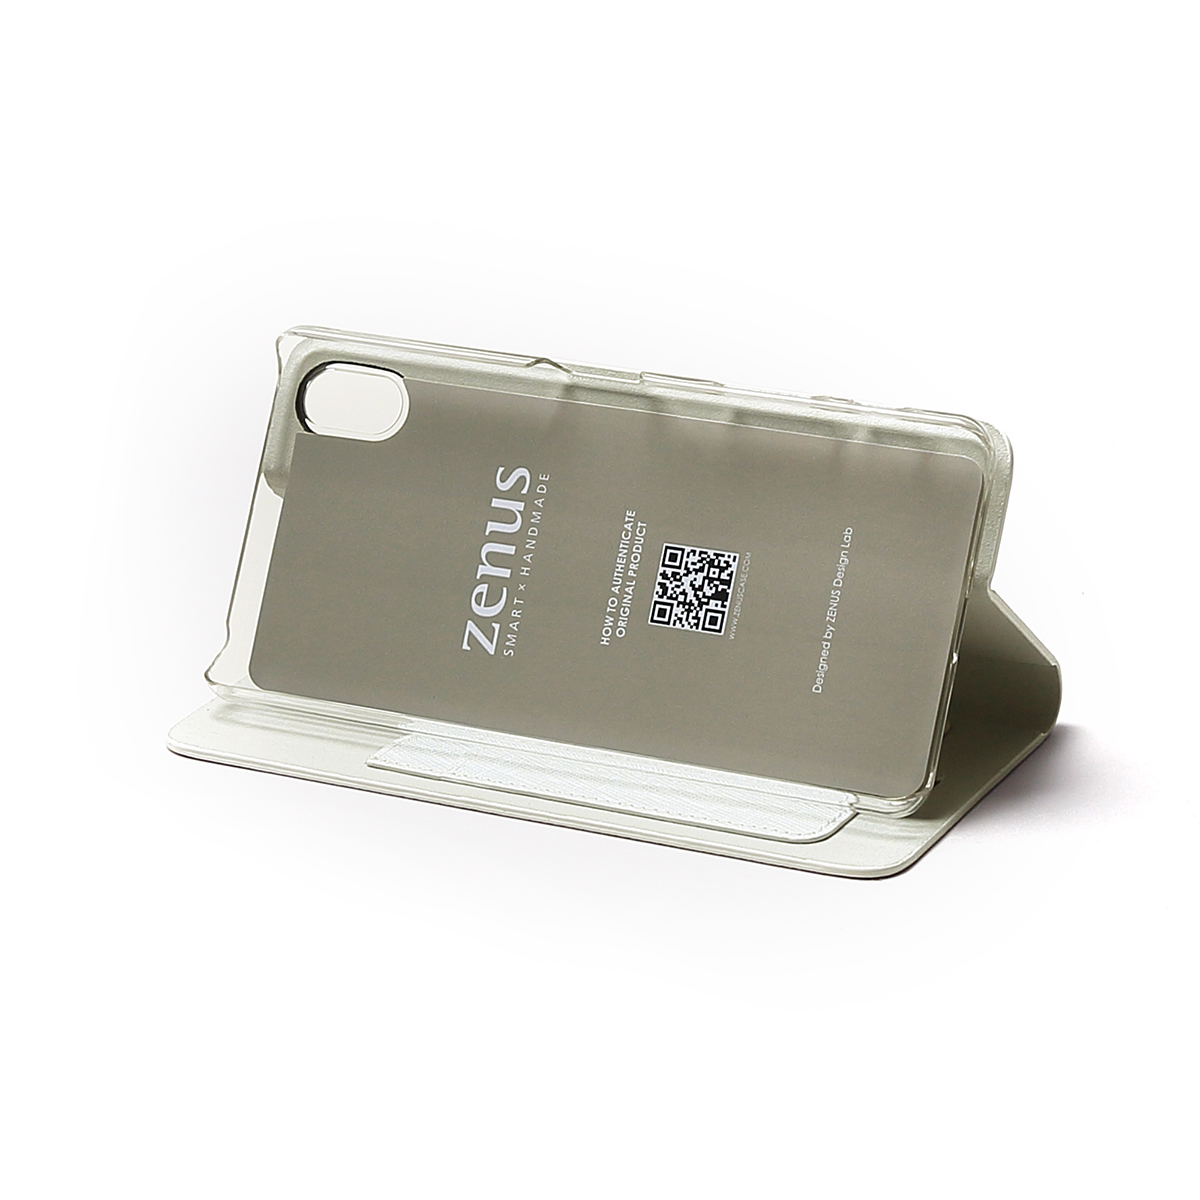 Xperia X Performance ケース 手帳型 ZENUS Minimal Diary(ゼヌス ミニマルダイアリー)エクスペリア エックス パフォーマンス SO-04H SOV33 502SO 本革 カバー